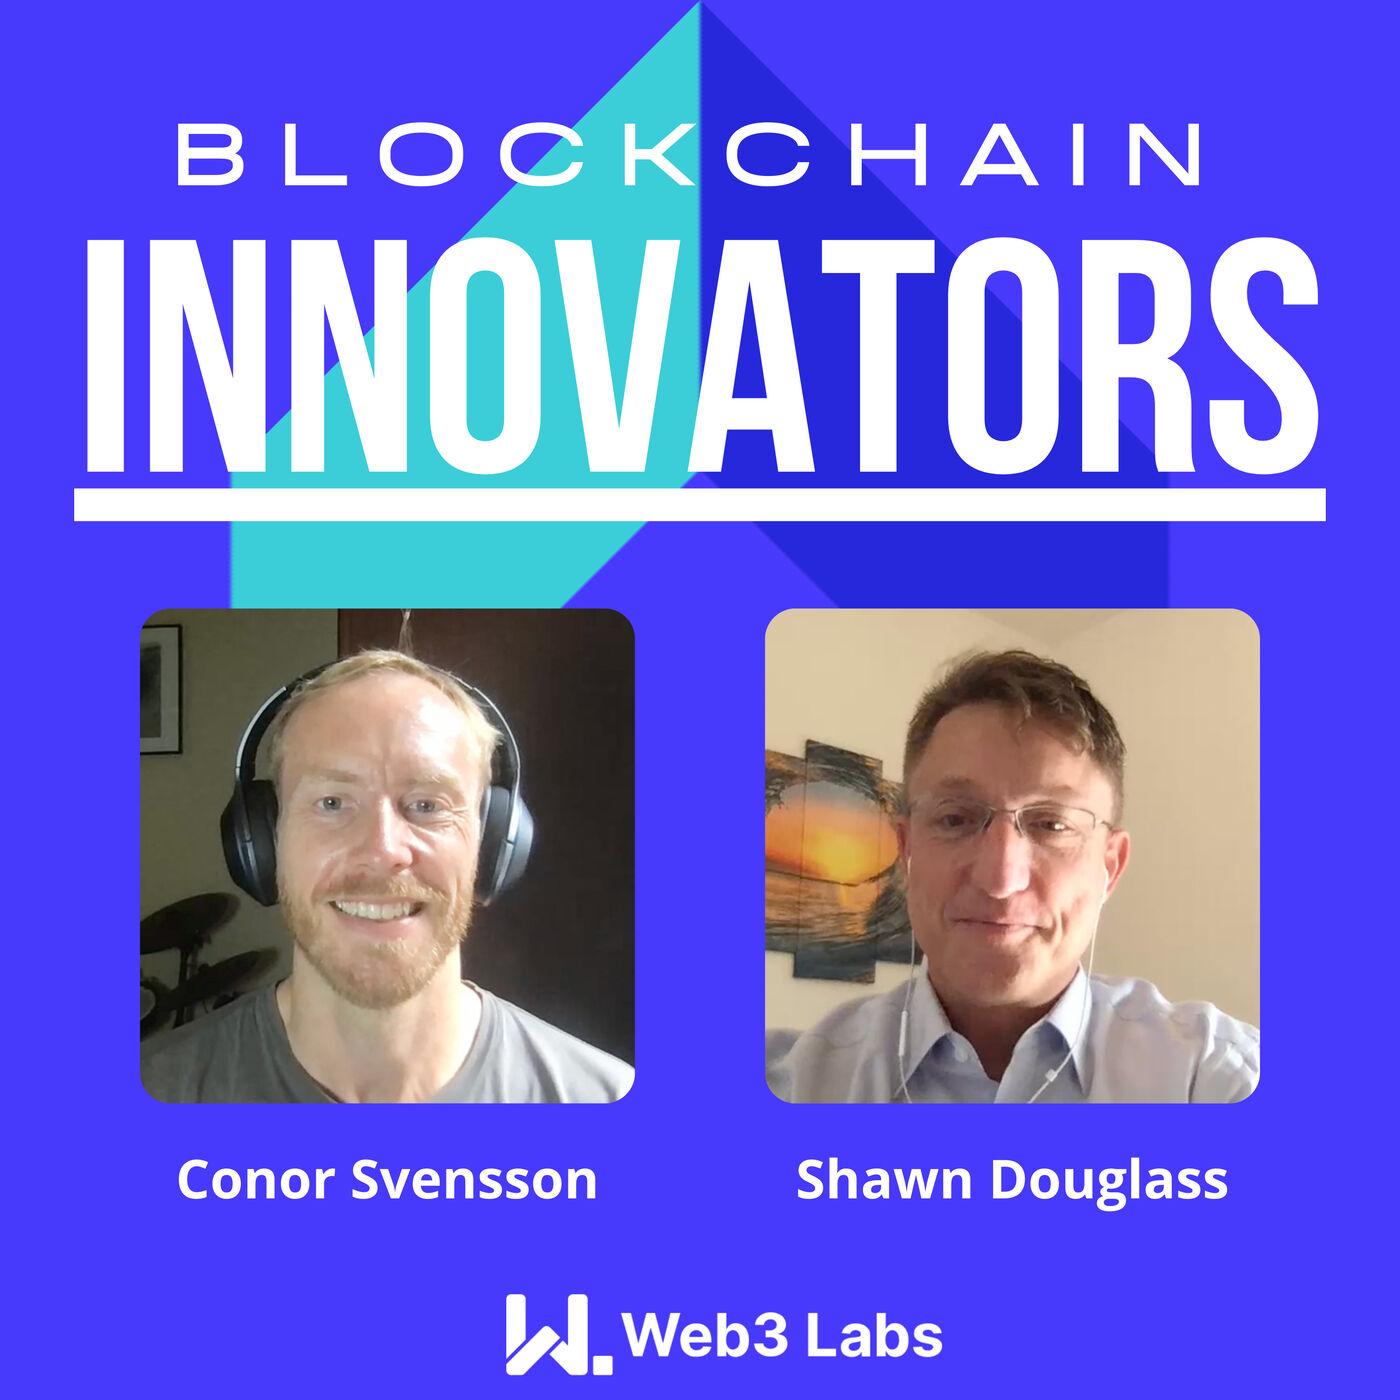 Blockchain Innovators - Conor Svensson and Shawn Douglass